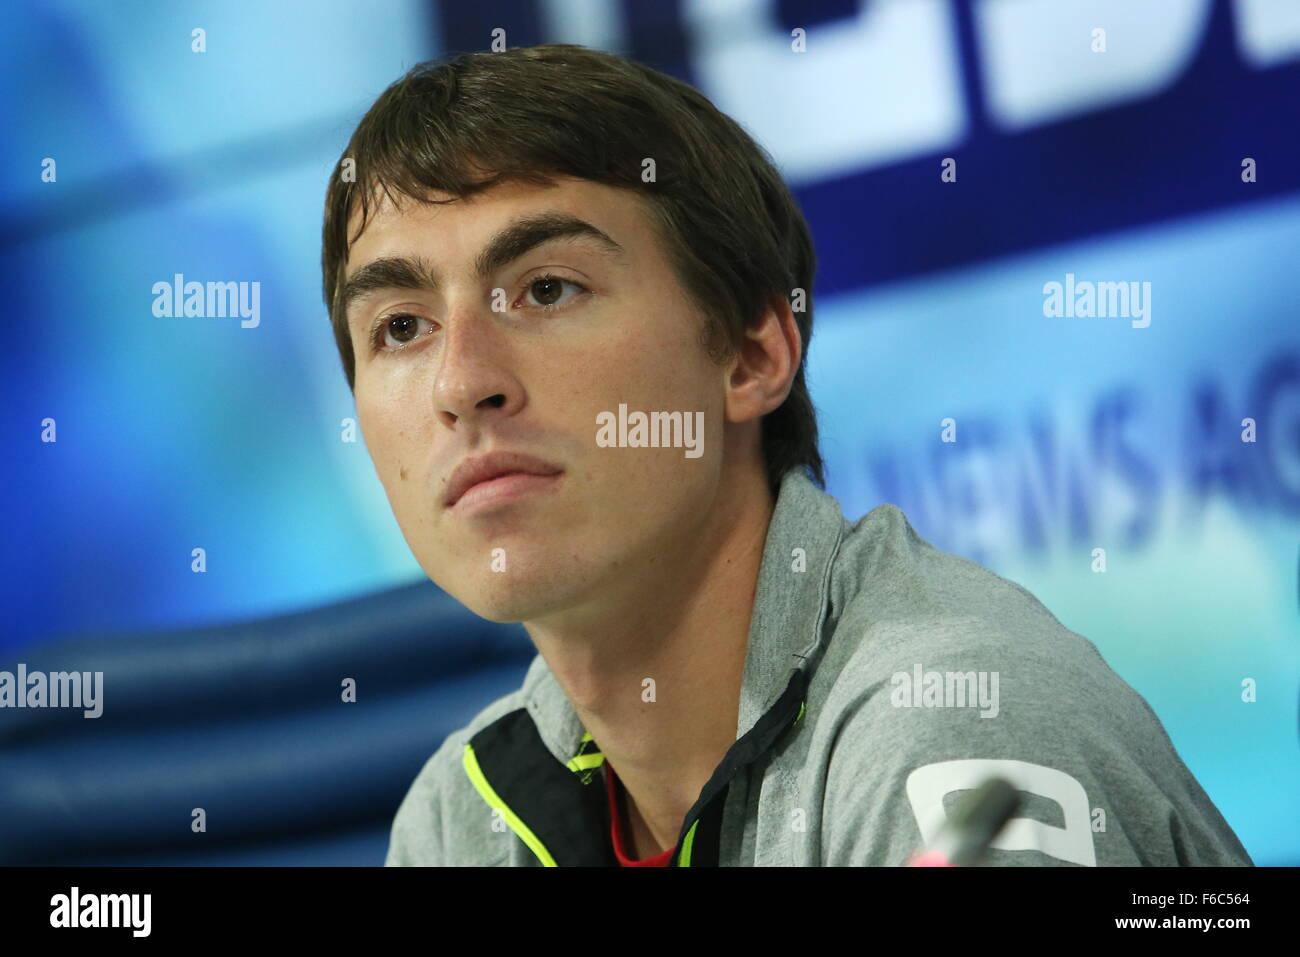 MOSCOW, RUSSIA. NOVEMBER 16, 2015. Russian athlete Sergey Shubenkov, 2015 World 110 Metres Hurdles Champion, two - Stock Image